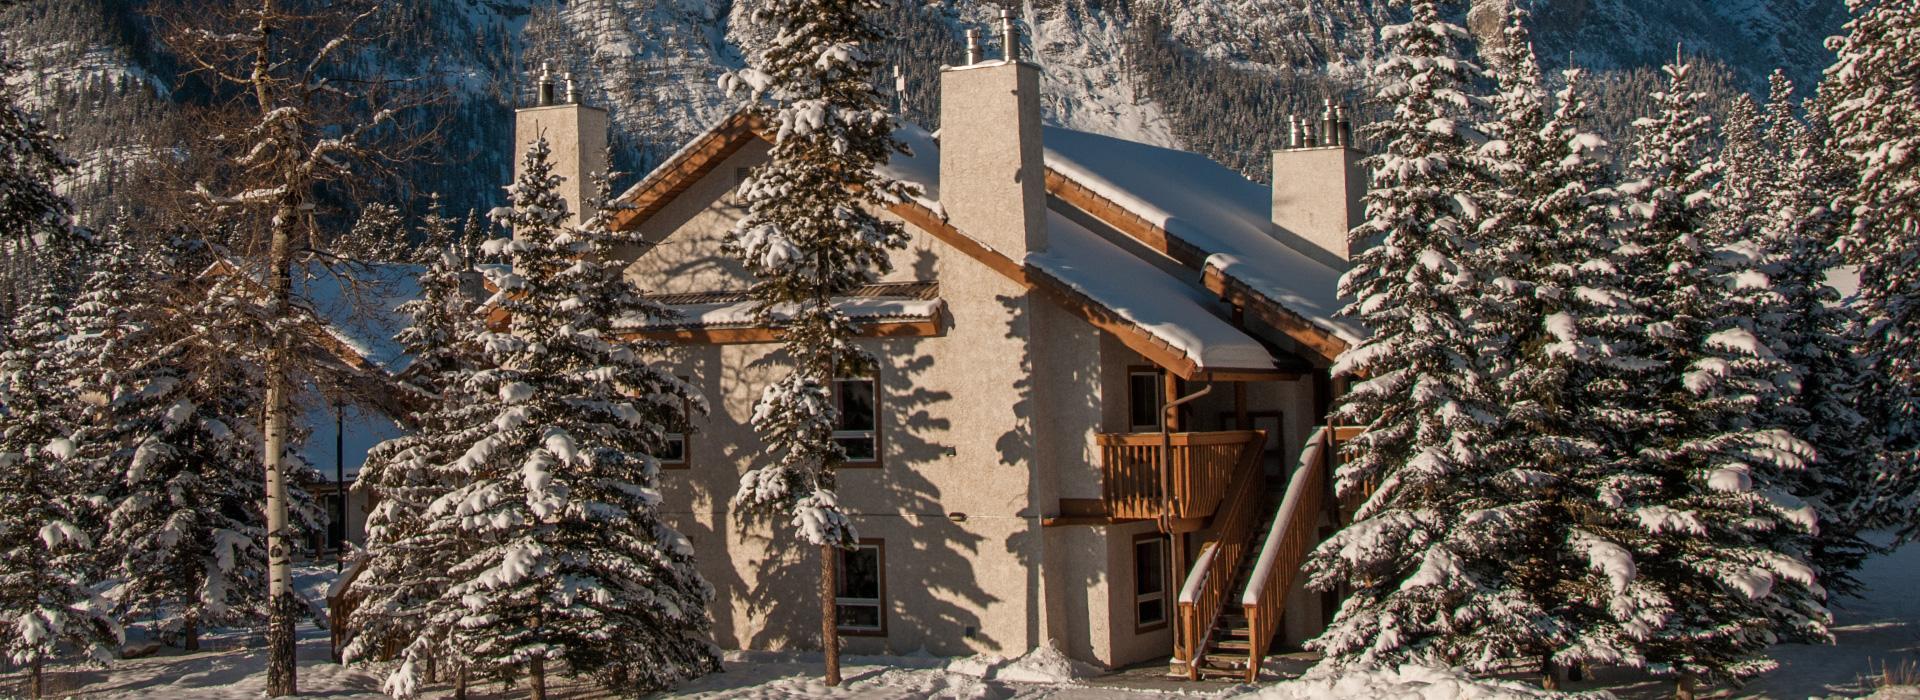 Banff Rocky Mountain Resort Banff Hotel Condos